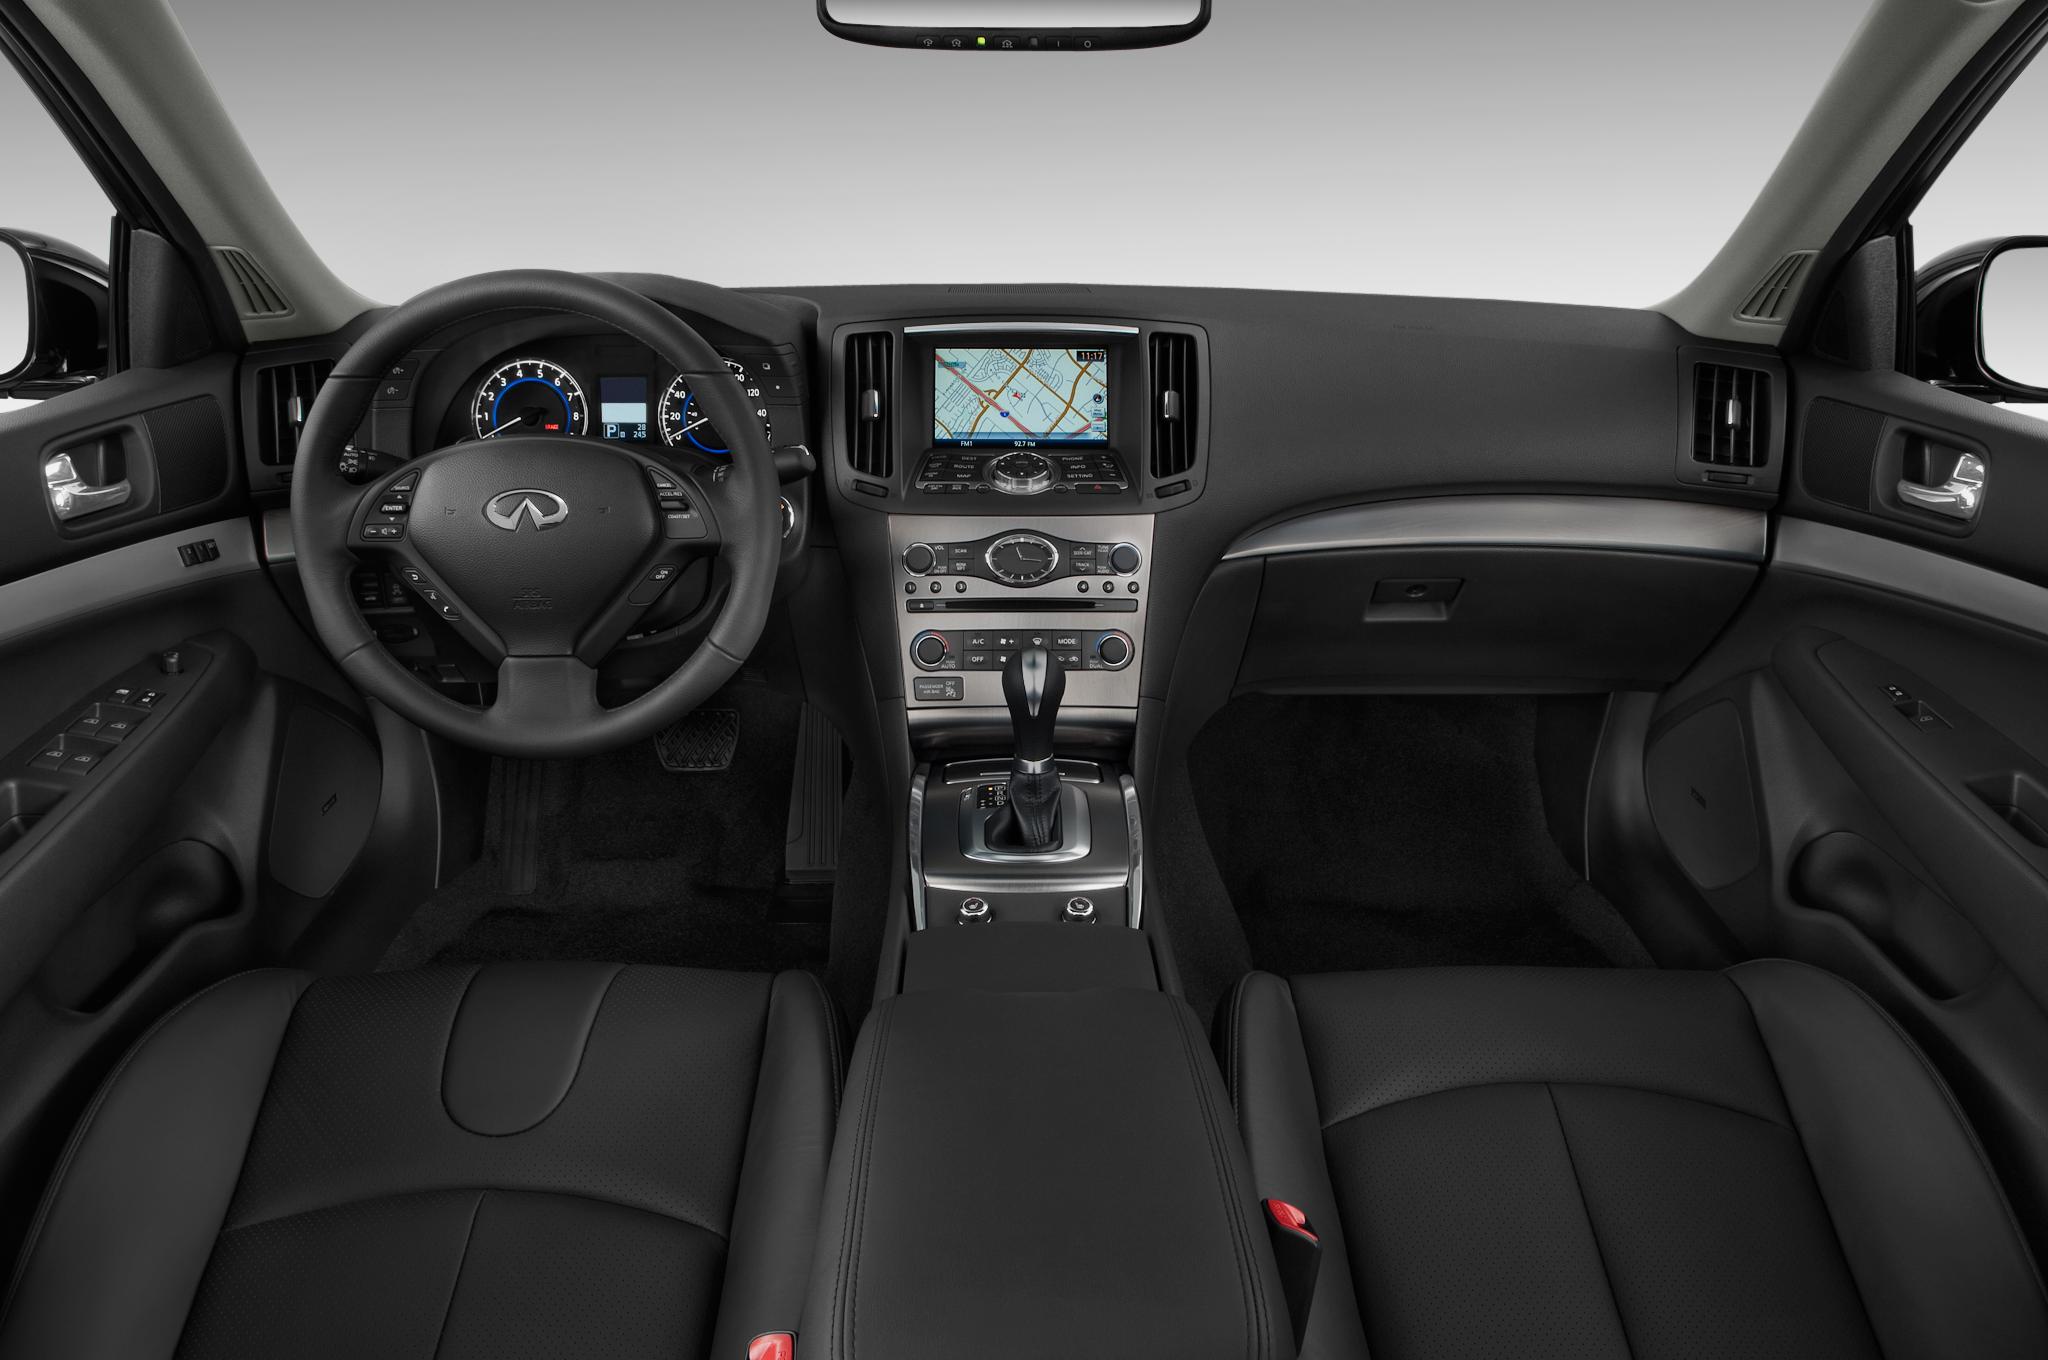 2010 infiniti g37 convertible owners manual